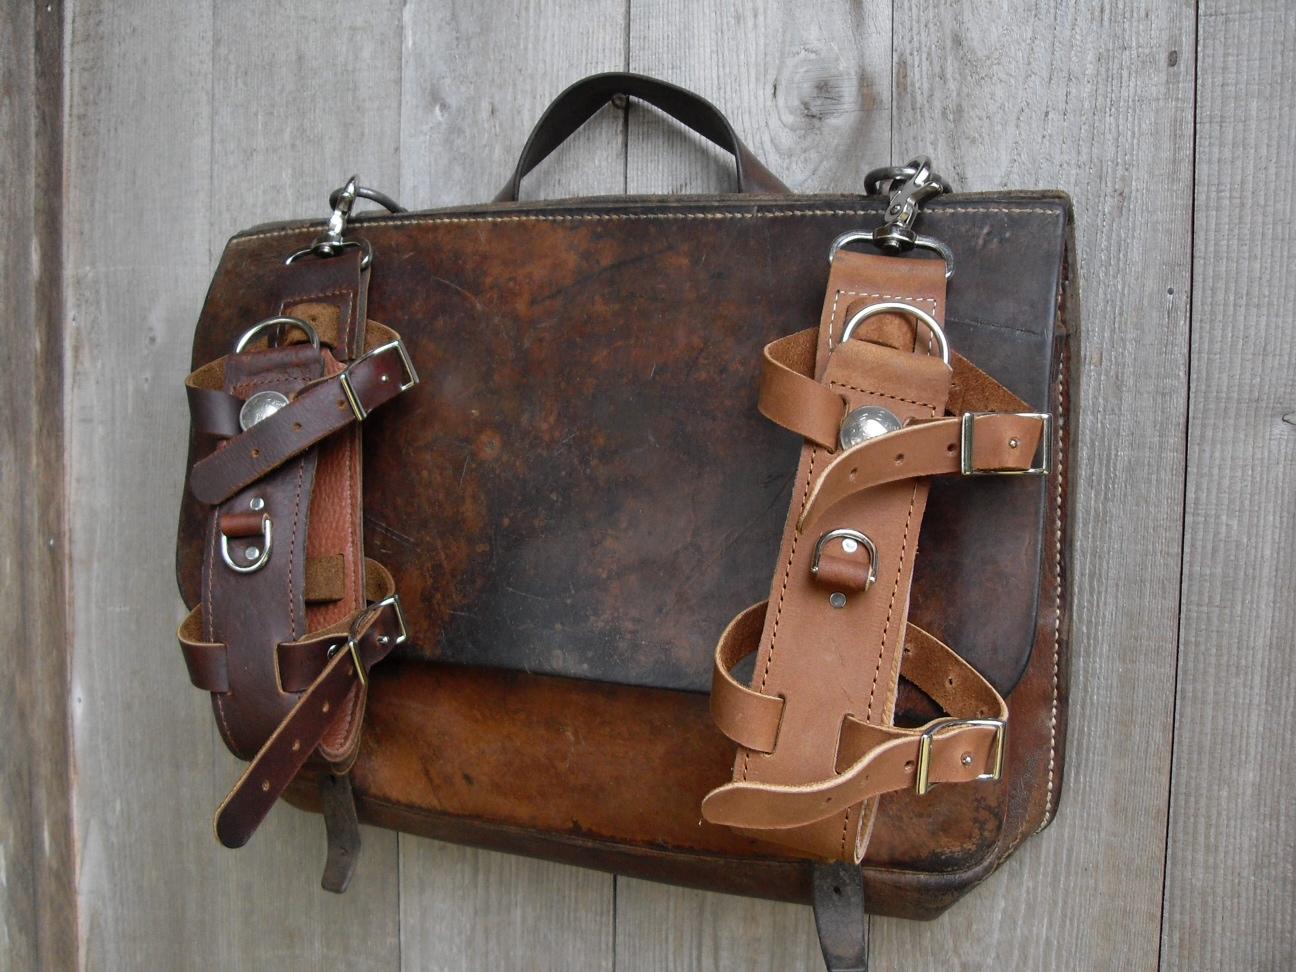 Leatherwerk swiss army messenger style bag with bottle harness swiss army messenger style bag with bottle harness colourmoves Gallery